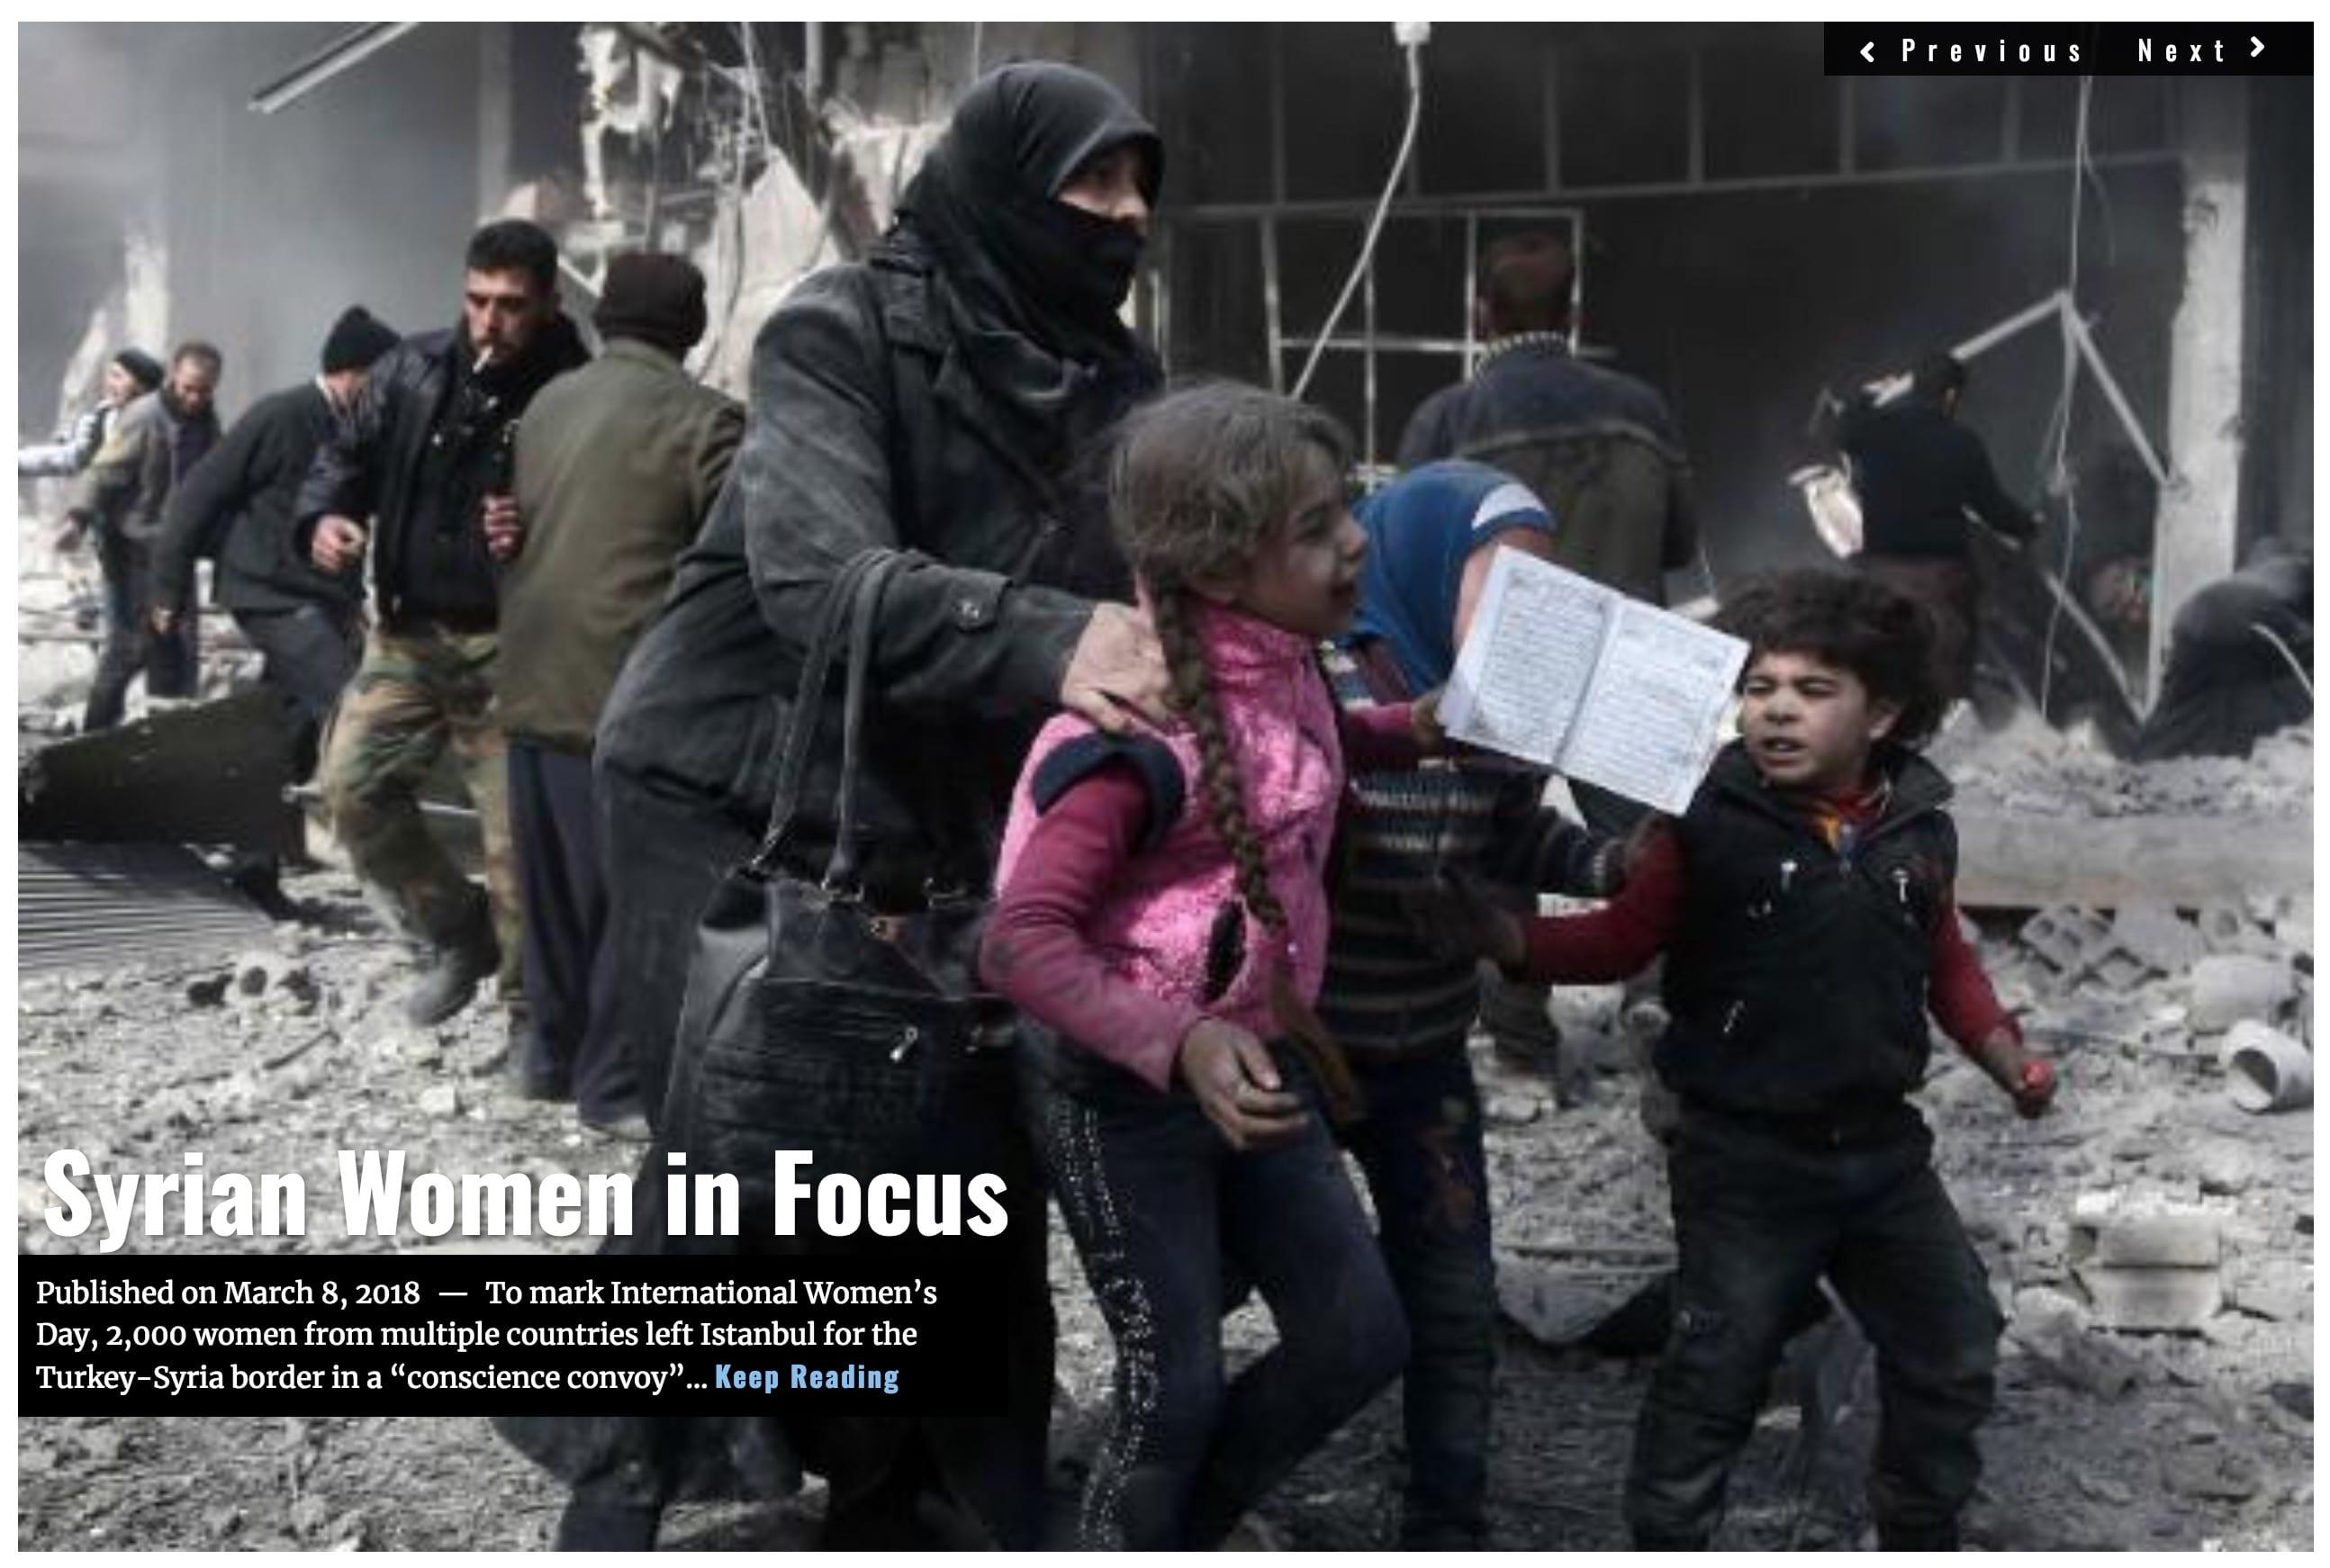 Image Lima Charlie News Headline Syria women MAR 8 2018